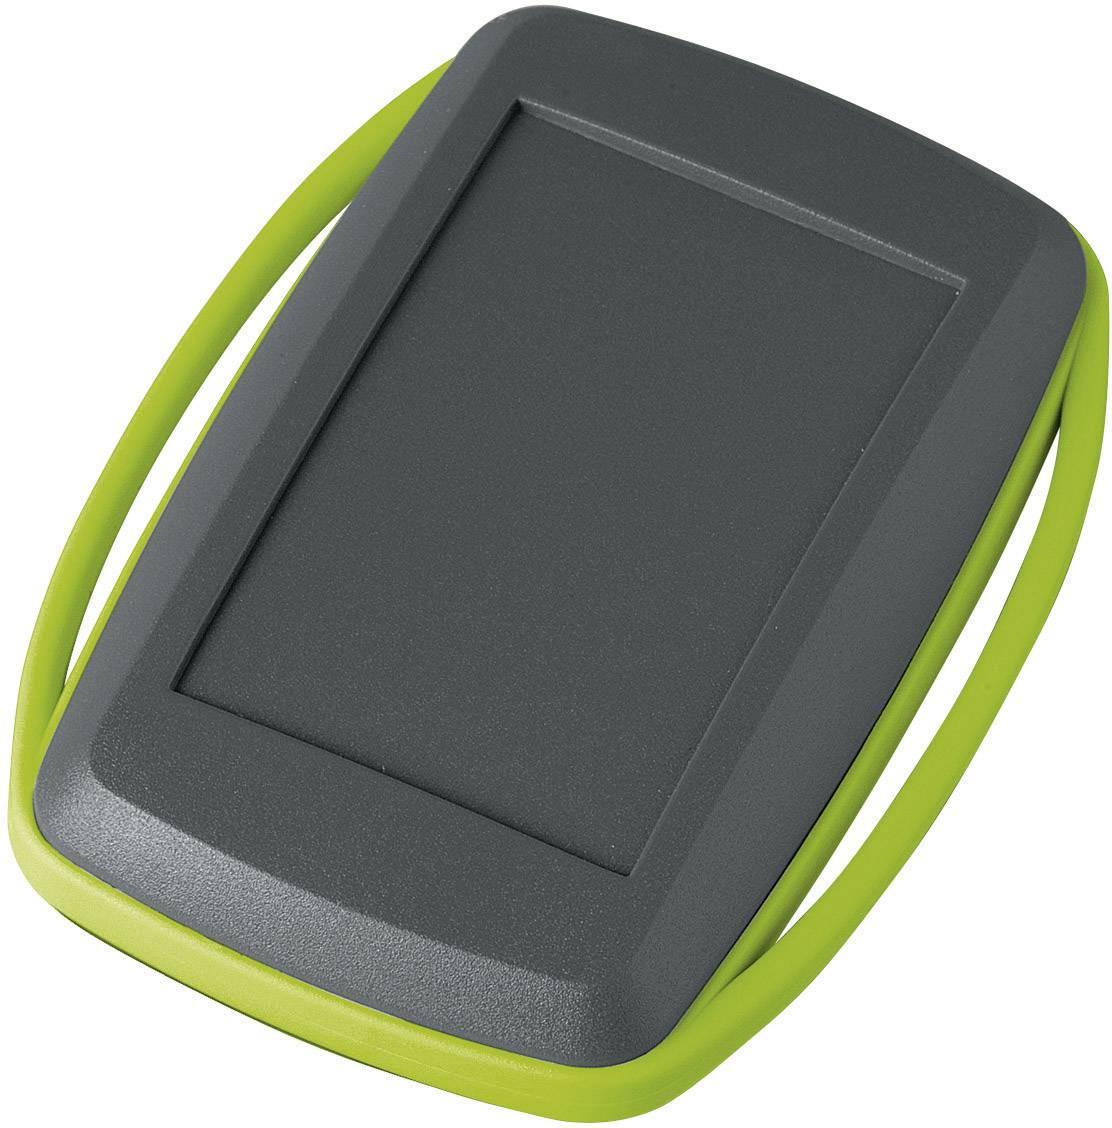 Plastová krabička OKW D9006178, 78 x 48 x 20 mm, umelá hmota, IP40, lávová, zelená, 1 sada